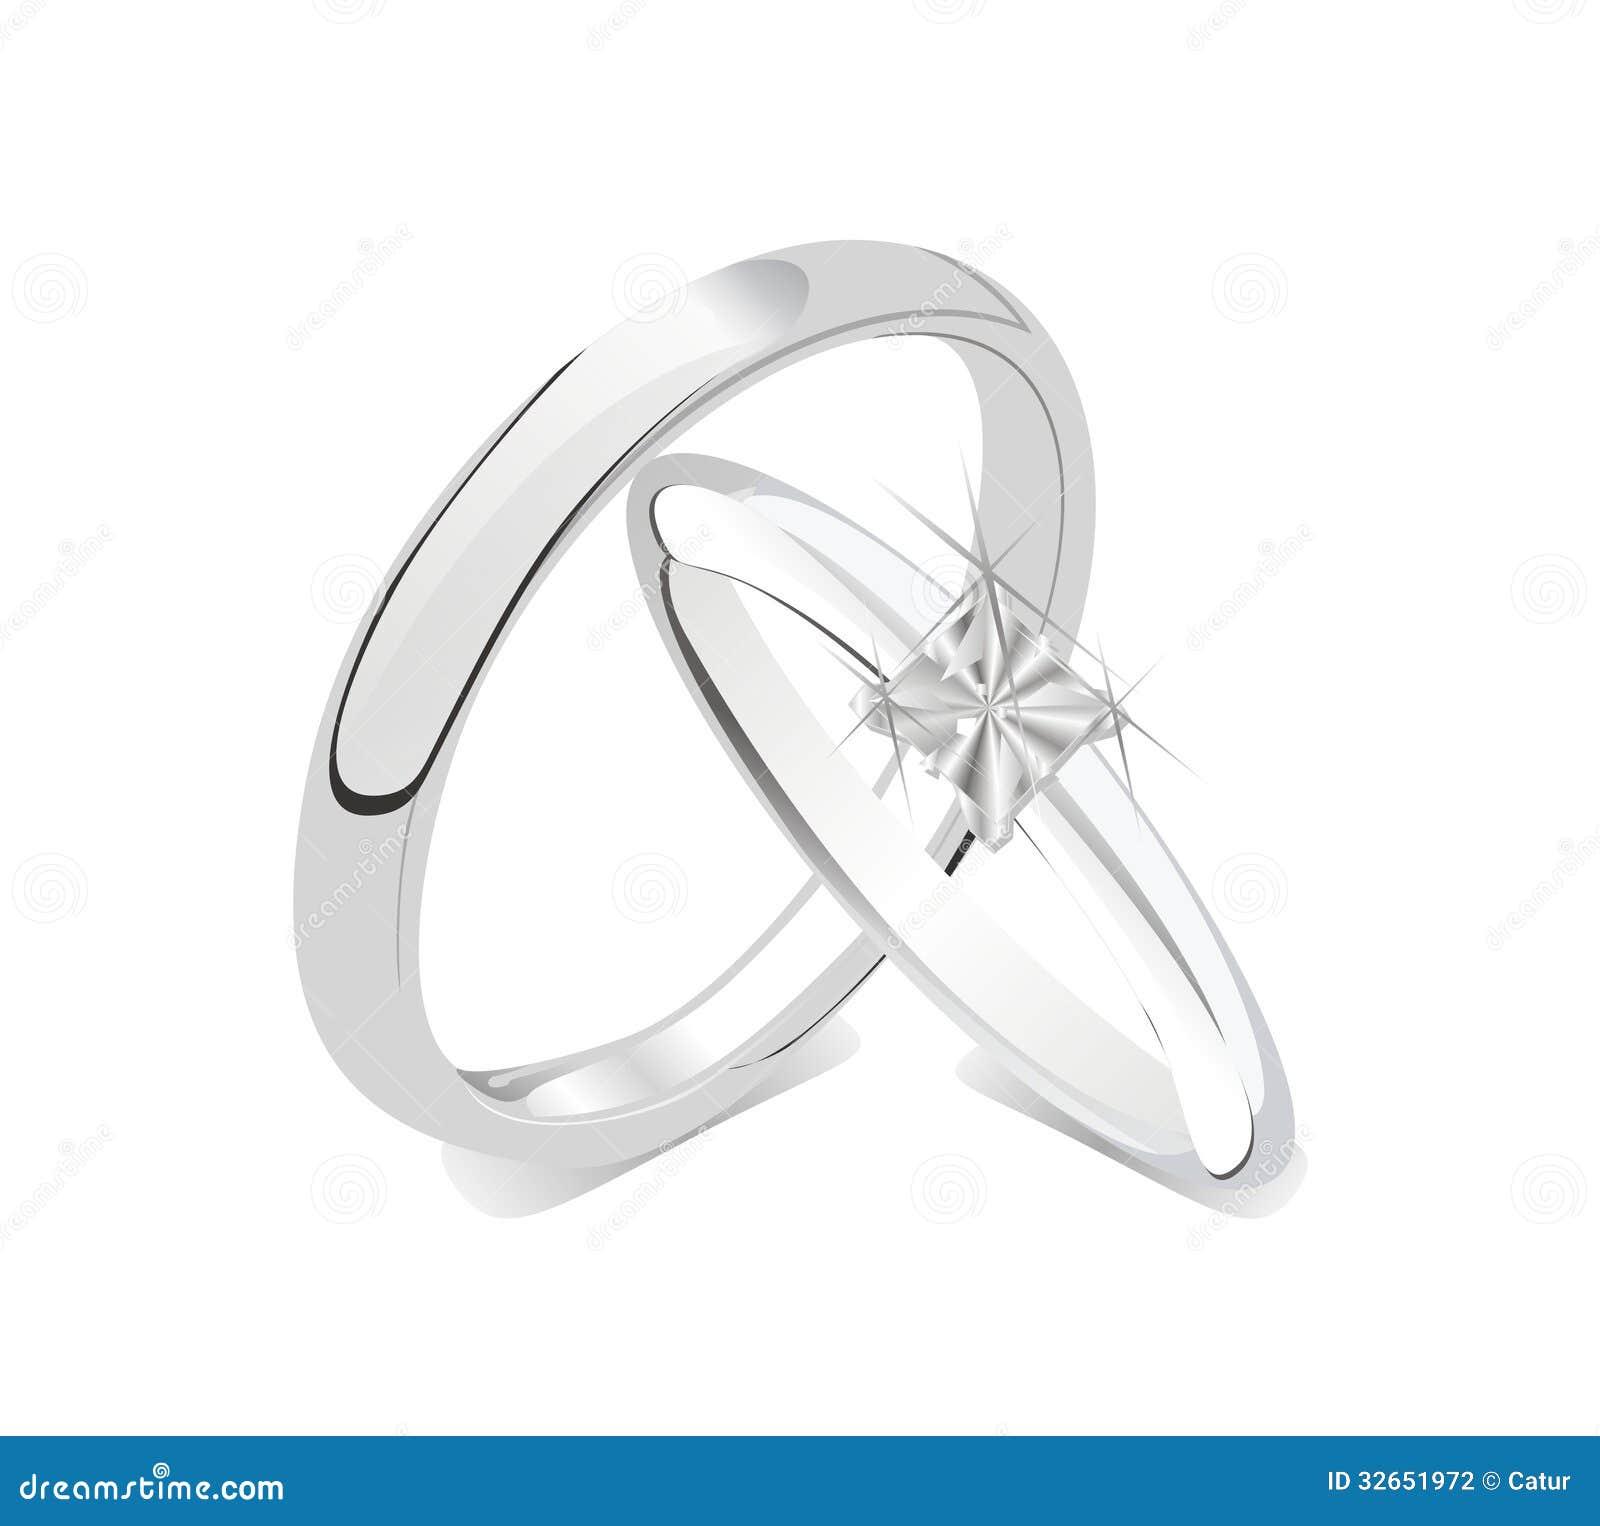 Couple Isolated Rings Romantic Shiny Wedding